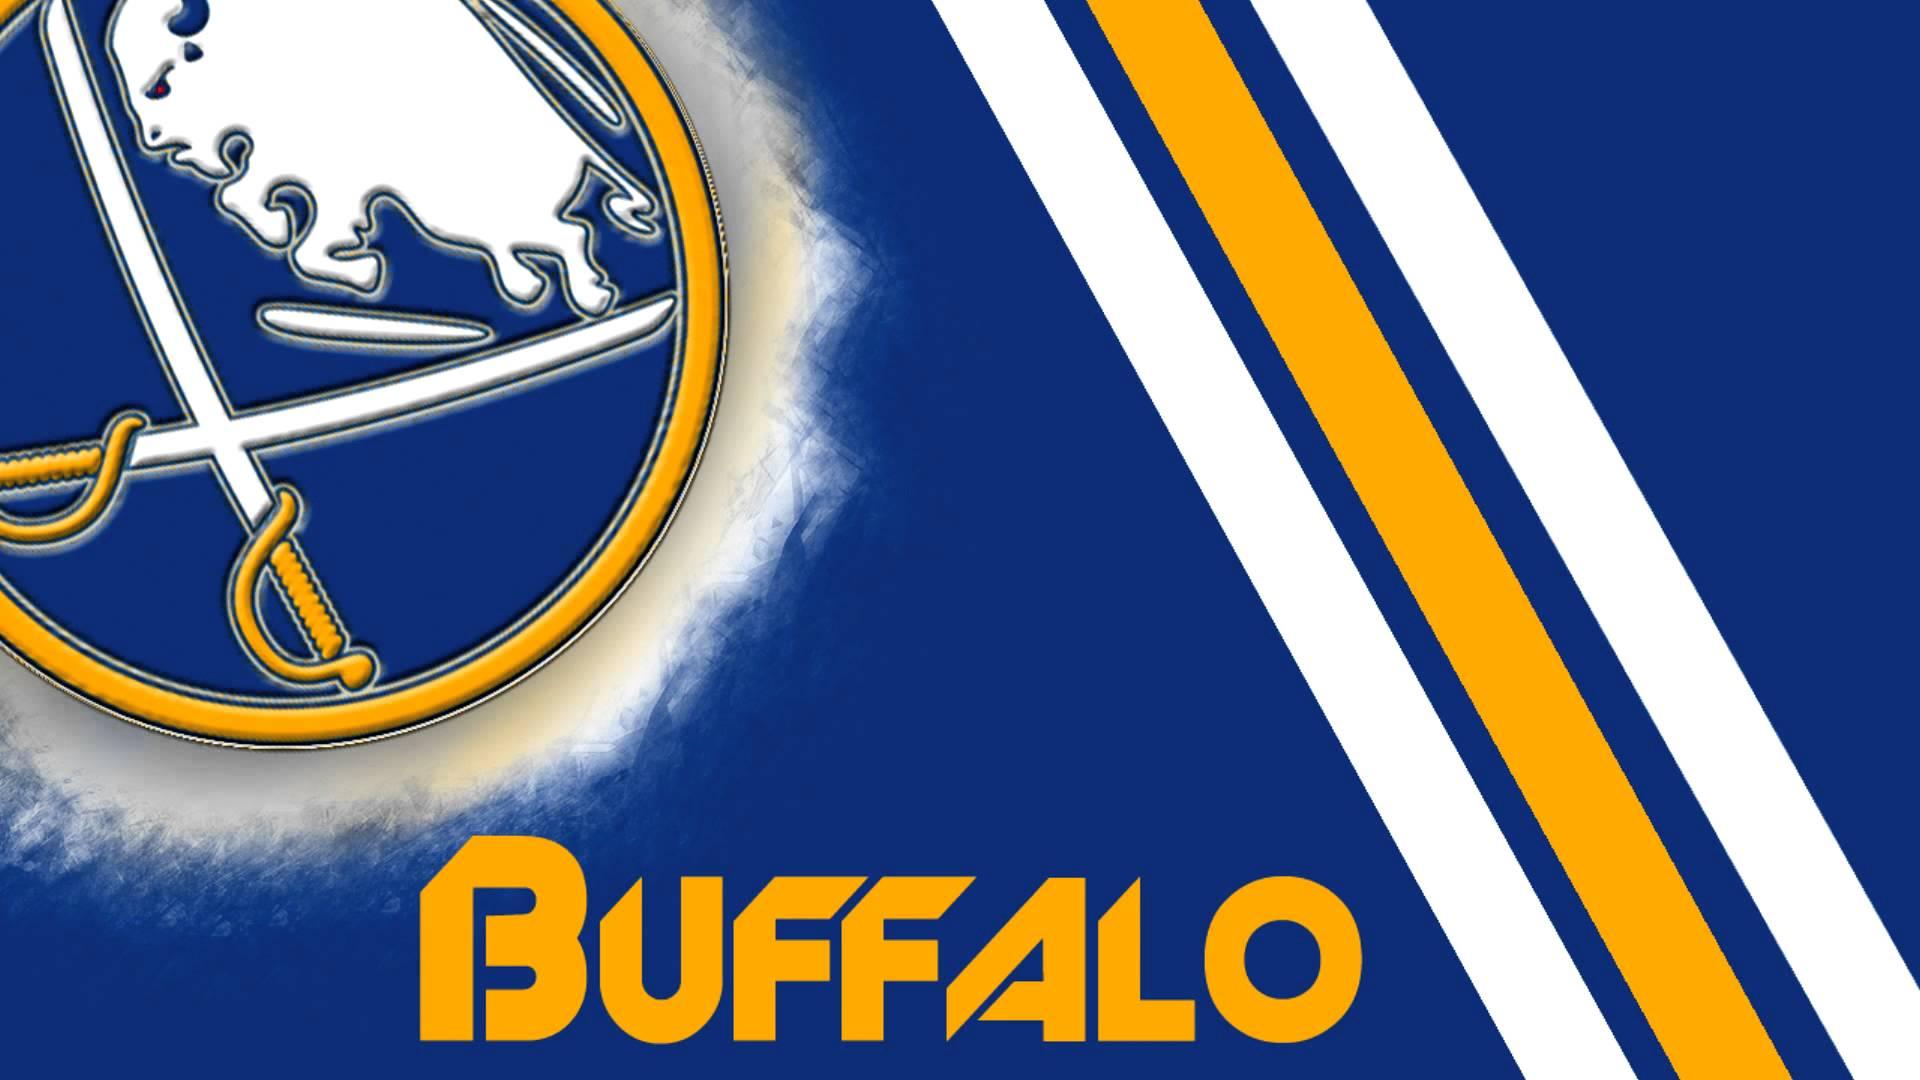 Buffalo Sabres Wallpaper 7   1920 X 1080 stmednet 1920x1080